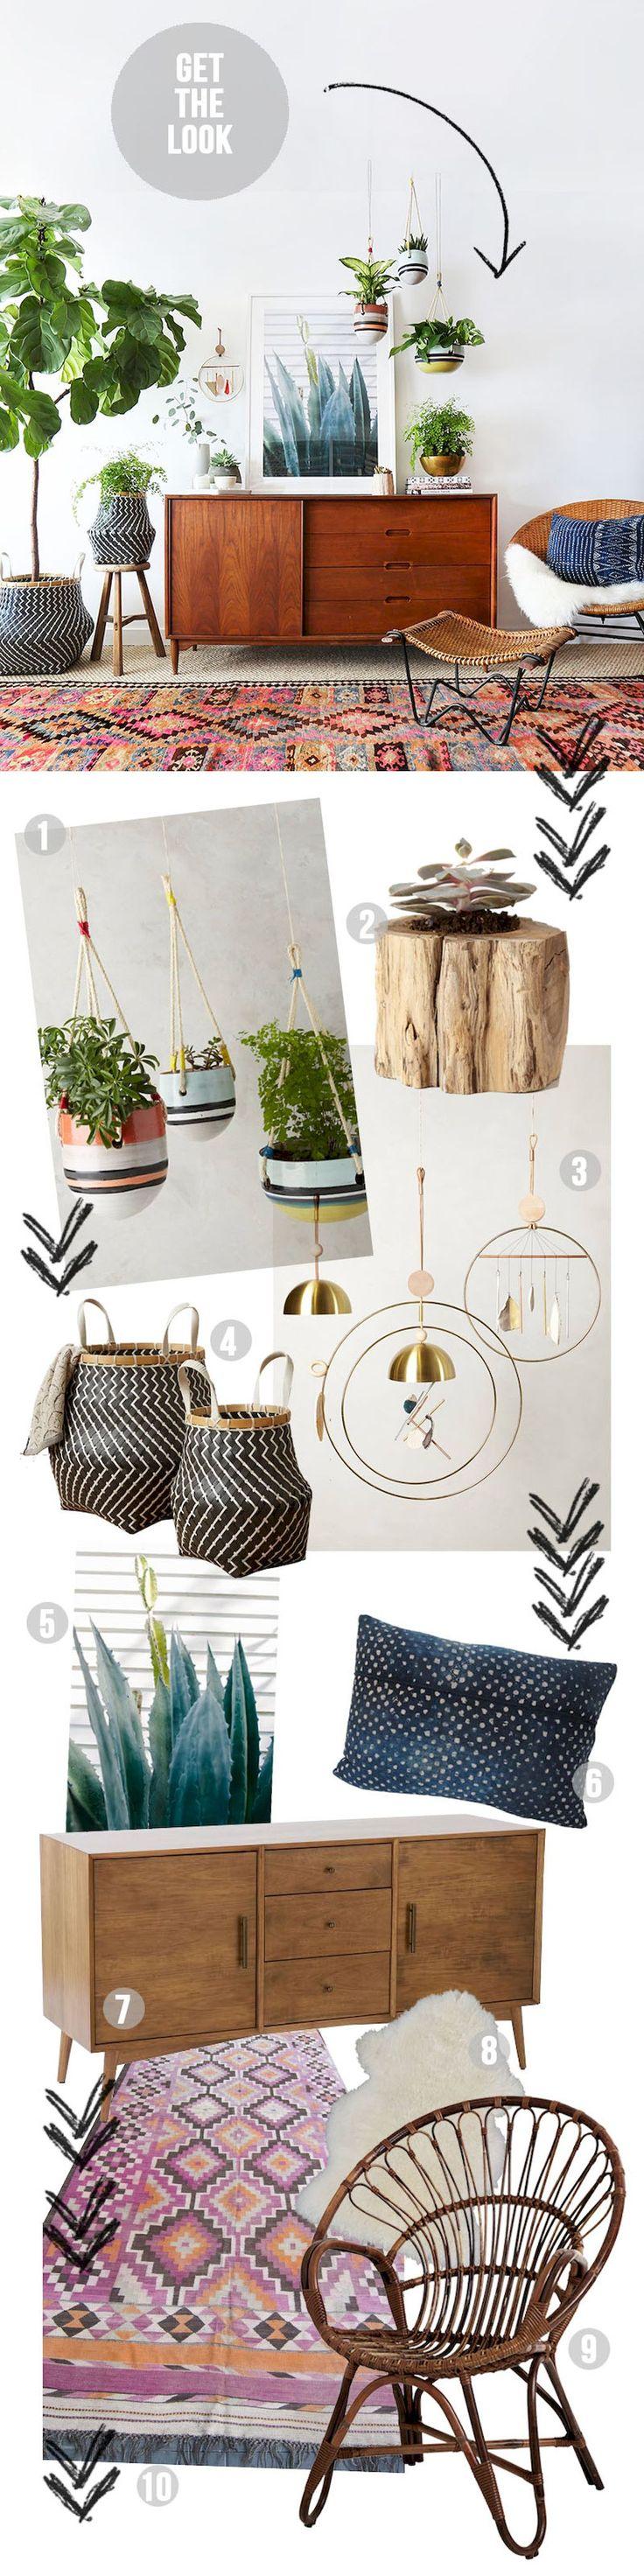 Cool 99 Stunning Boho Chic Living Room Decor Ideas on A Budget https://homeastern.com/2017/07/11/99-stunning-boho-livingroom-decor-ideas-budget/